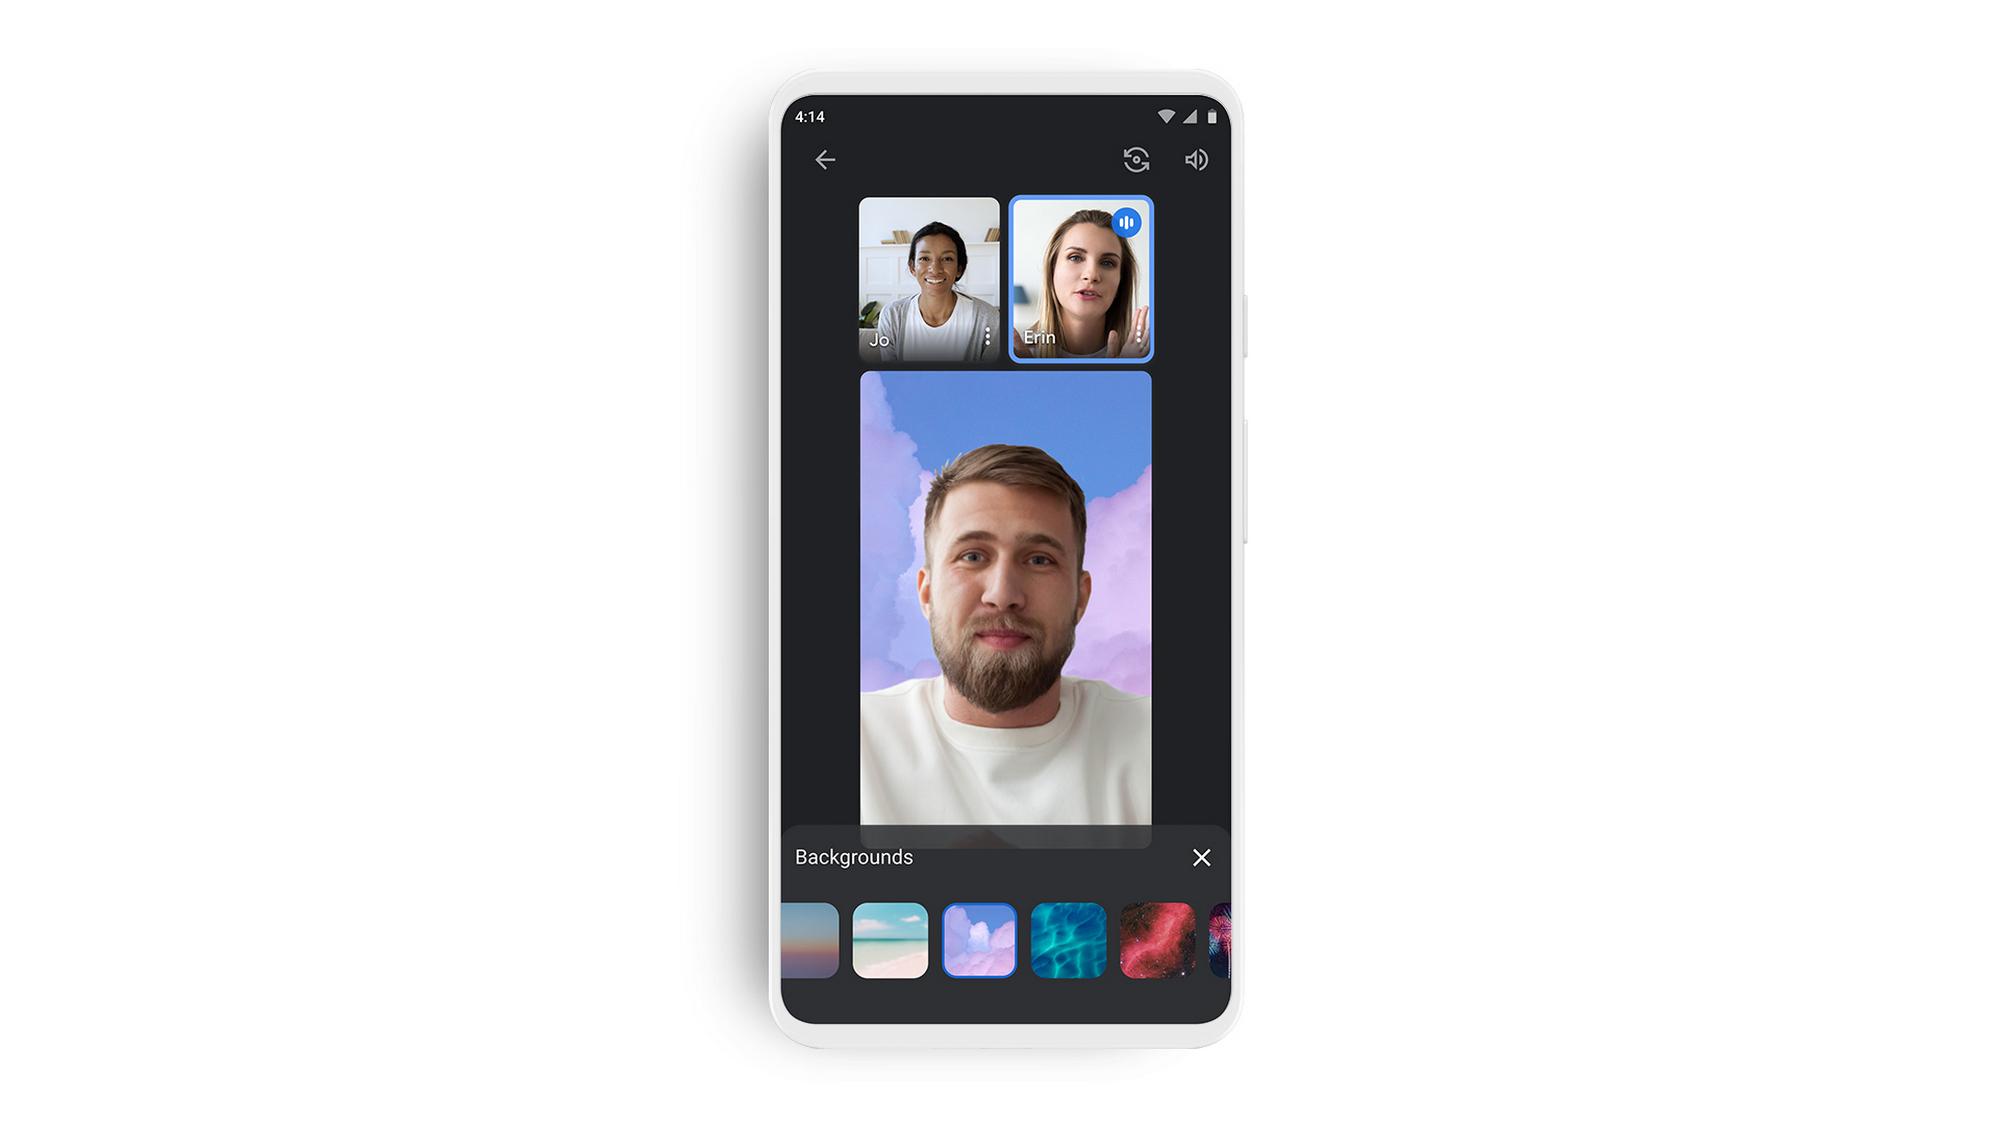 l'interface simplifiée de Google Meet sur smartphone